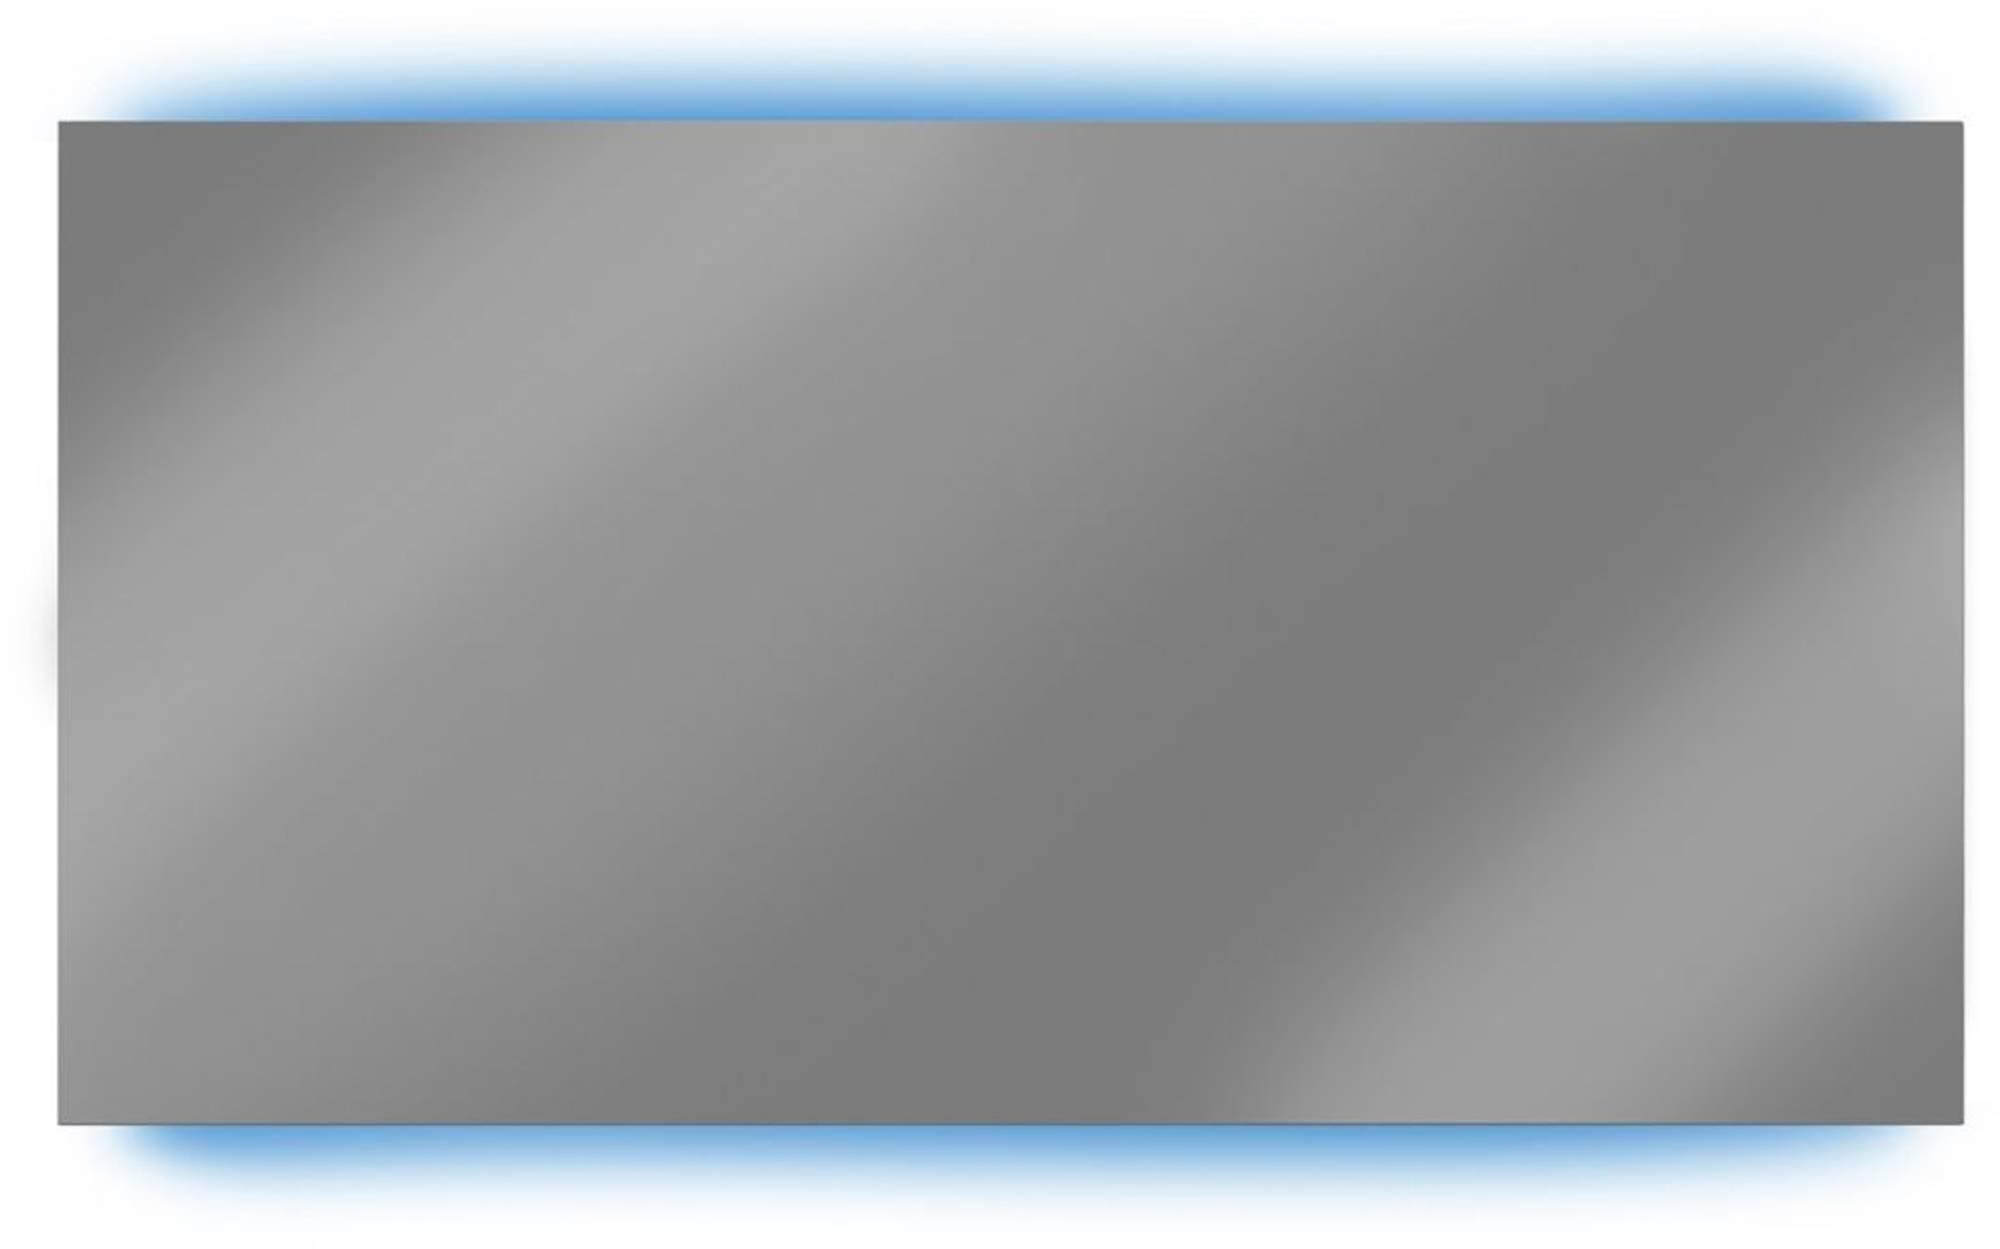 Looox C-line spiegel 140x70 cm. led verlichting boven en onder